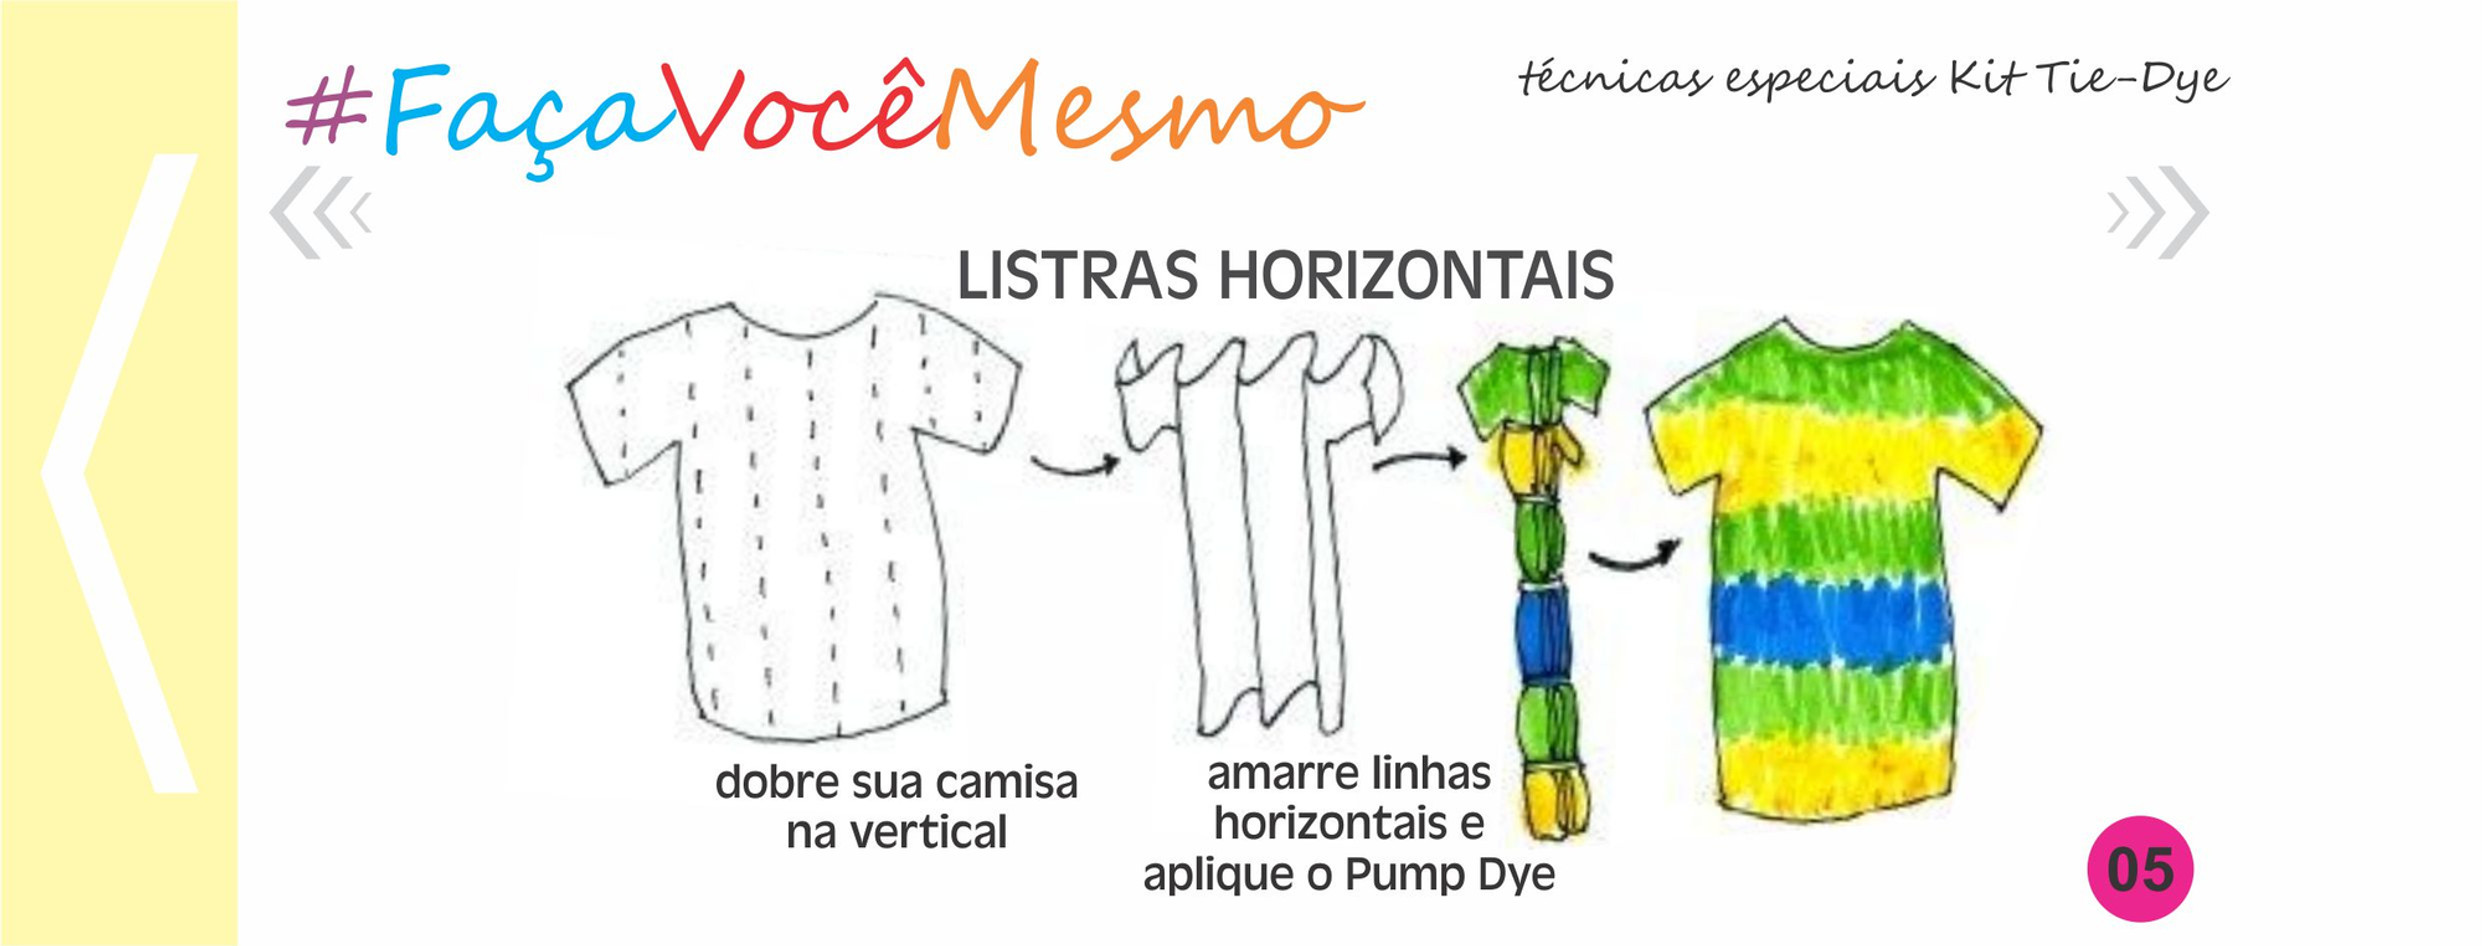 banner kit tie-dye pump dye 05.jpg